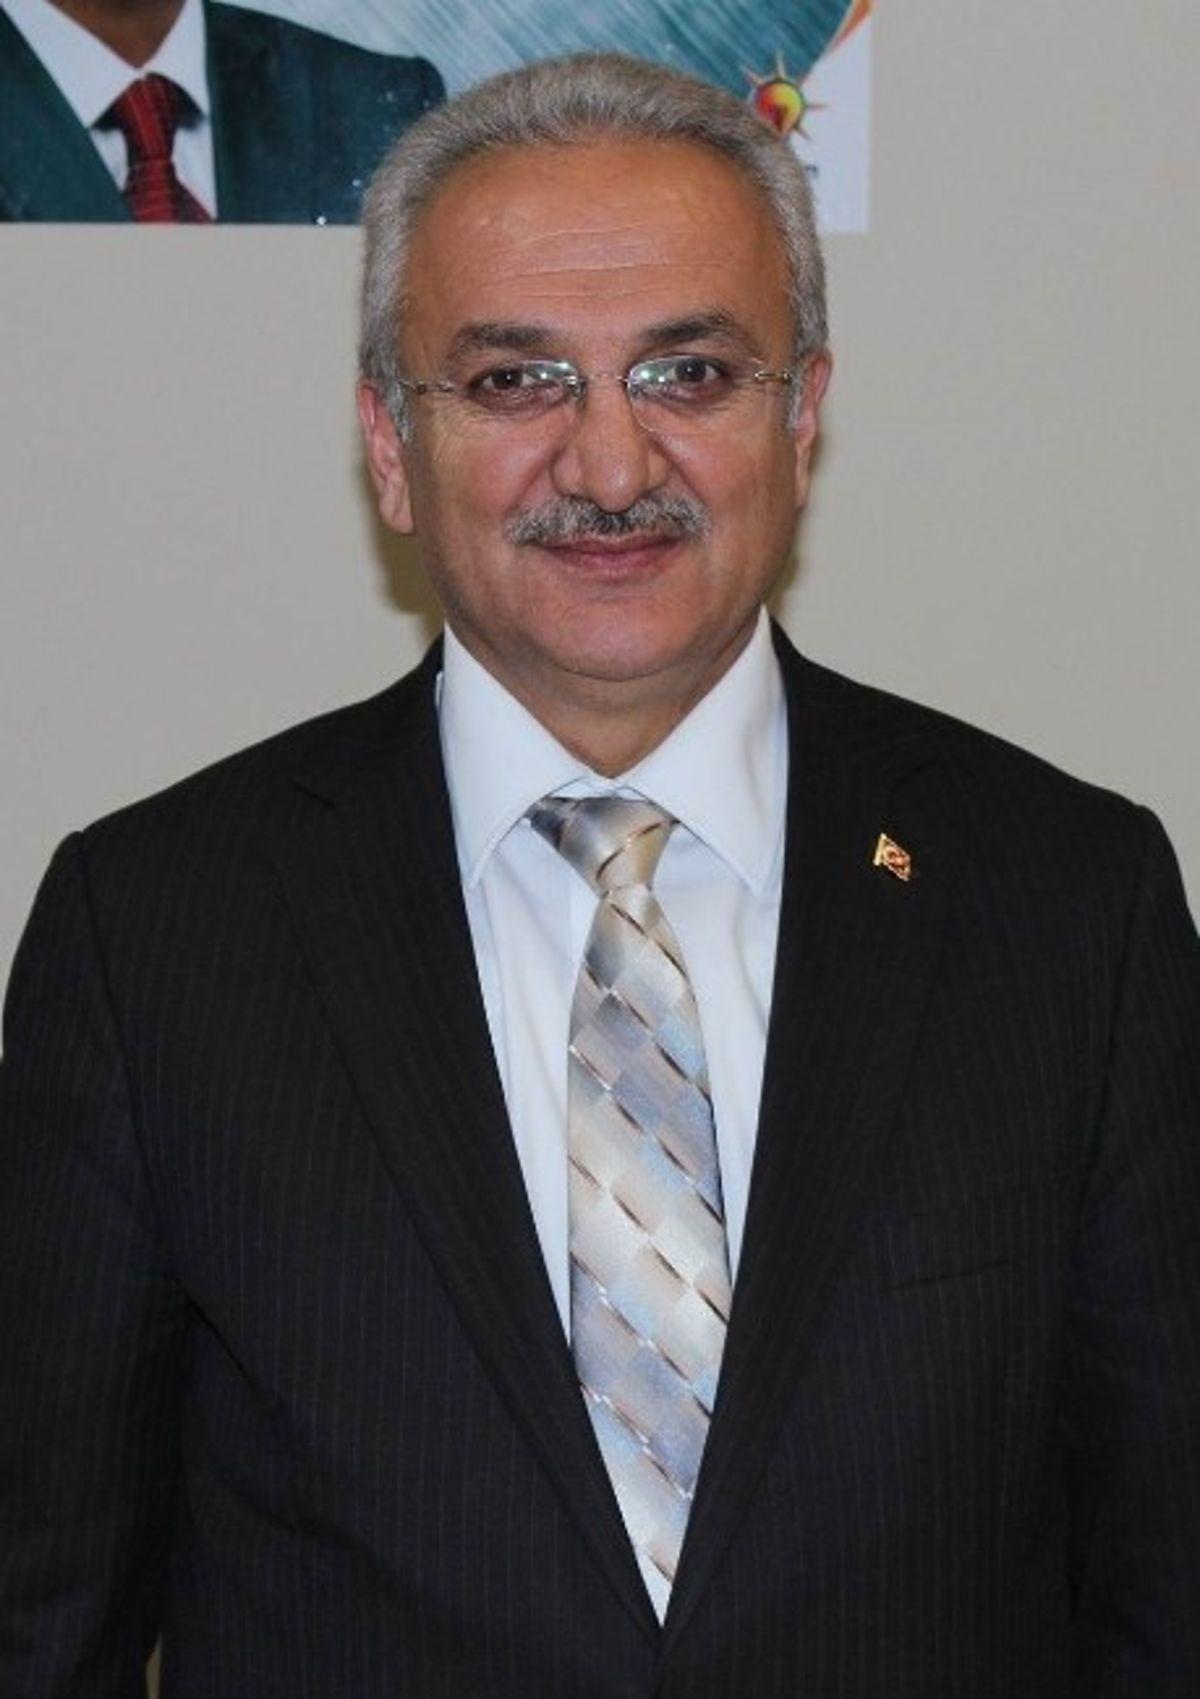 Erzincan'da AK Parti Adayı Cemalettin Başsoy Kazandı